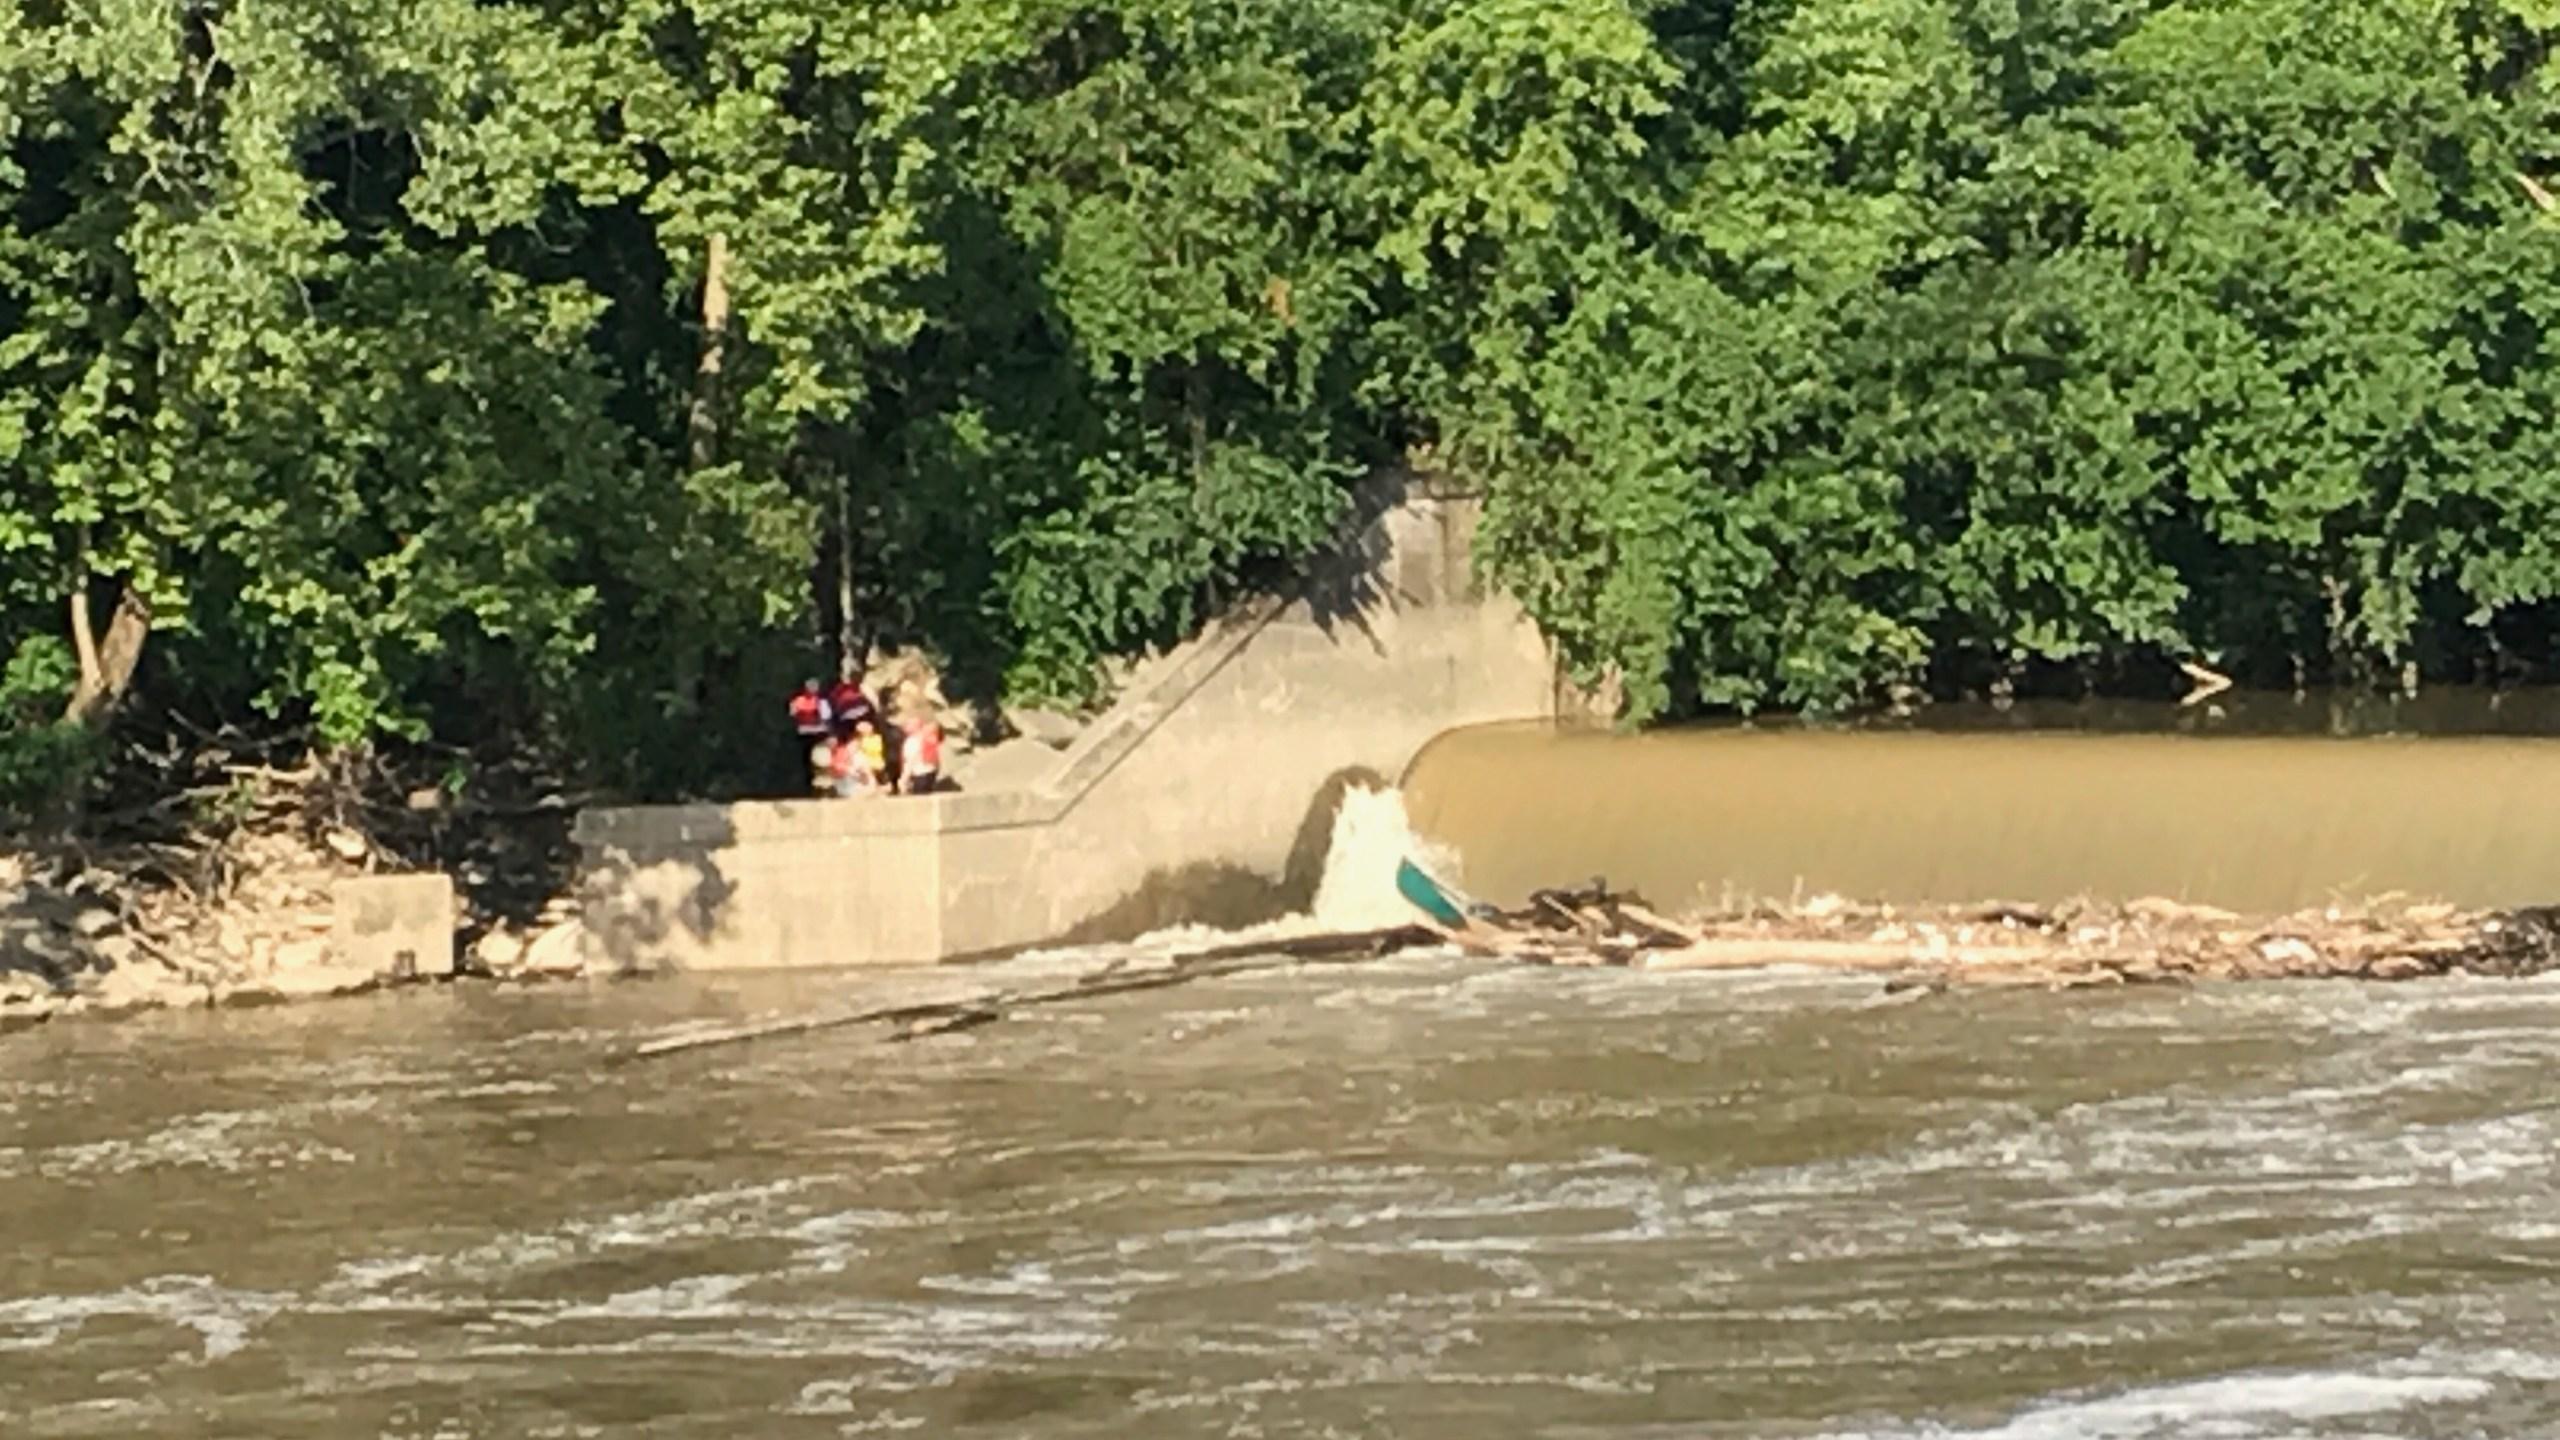 Canoe caught in dam._270810